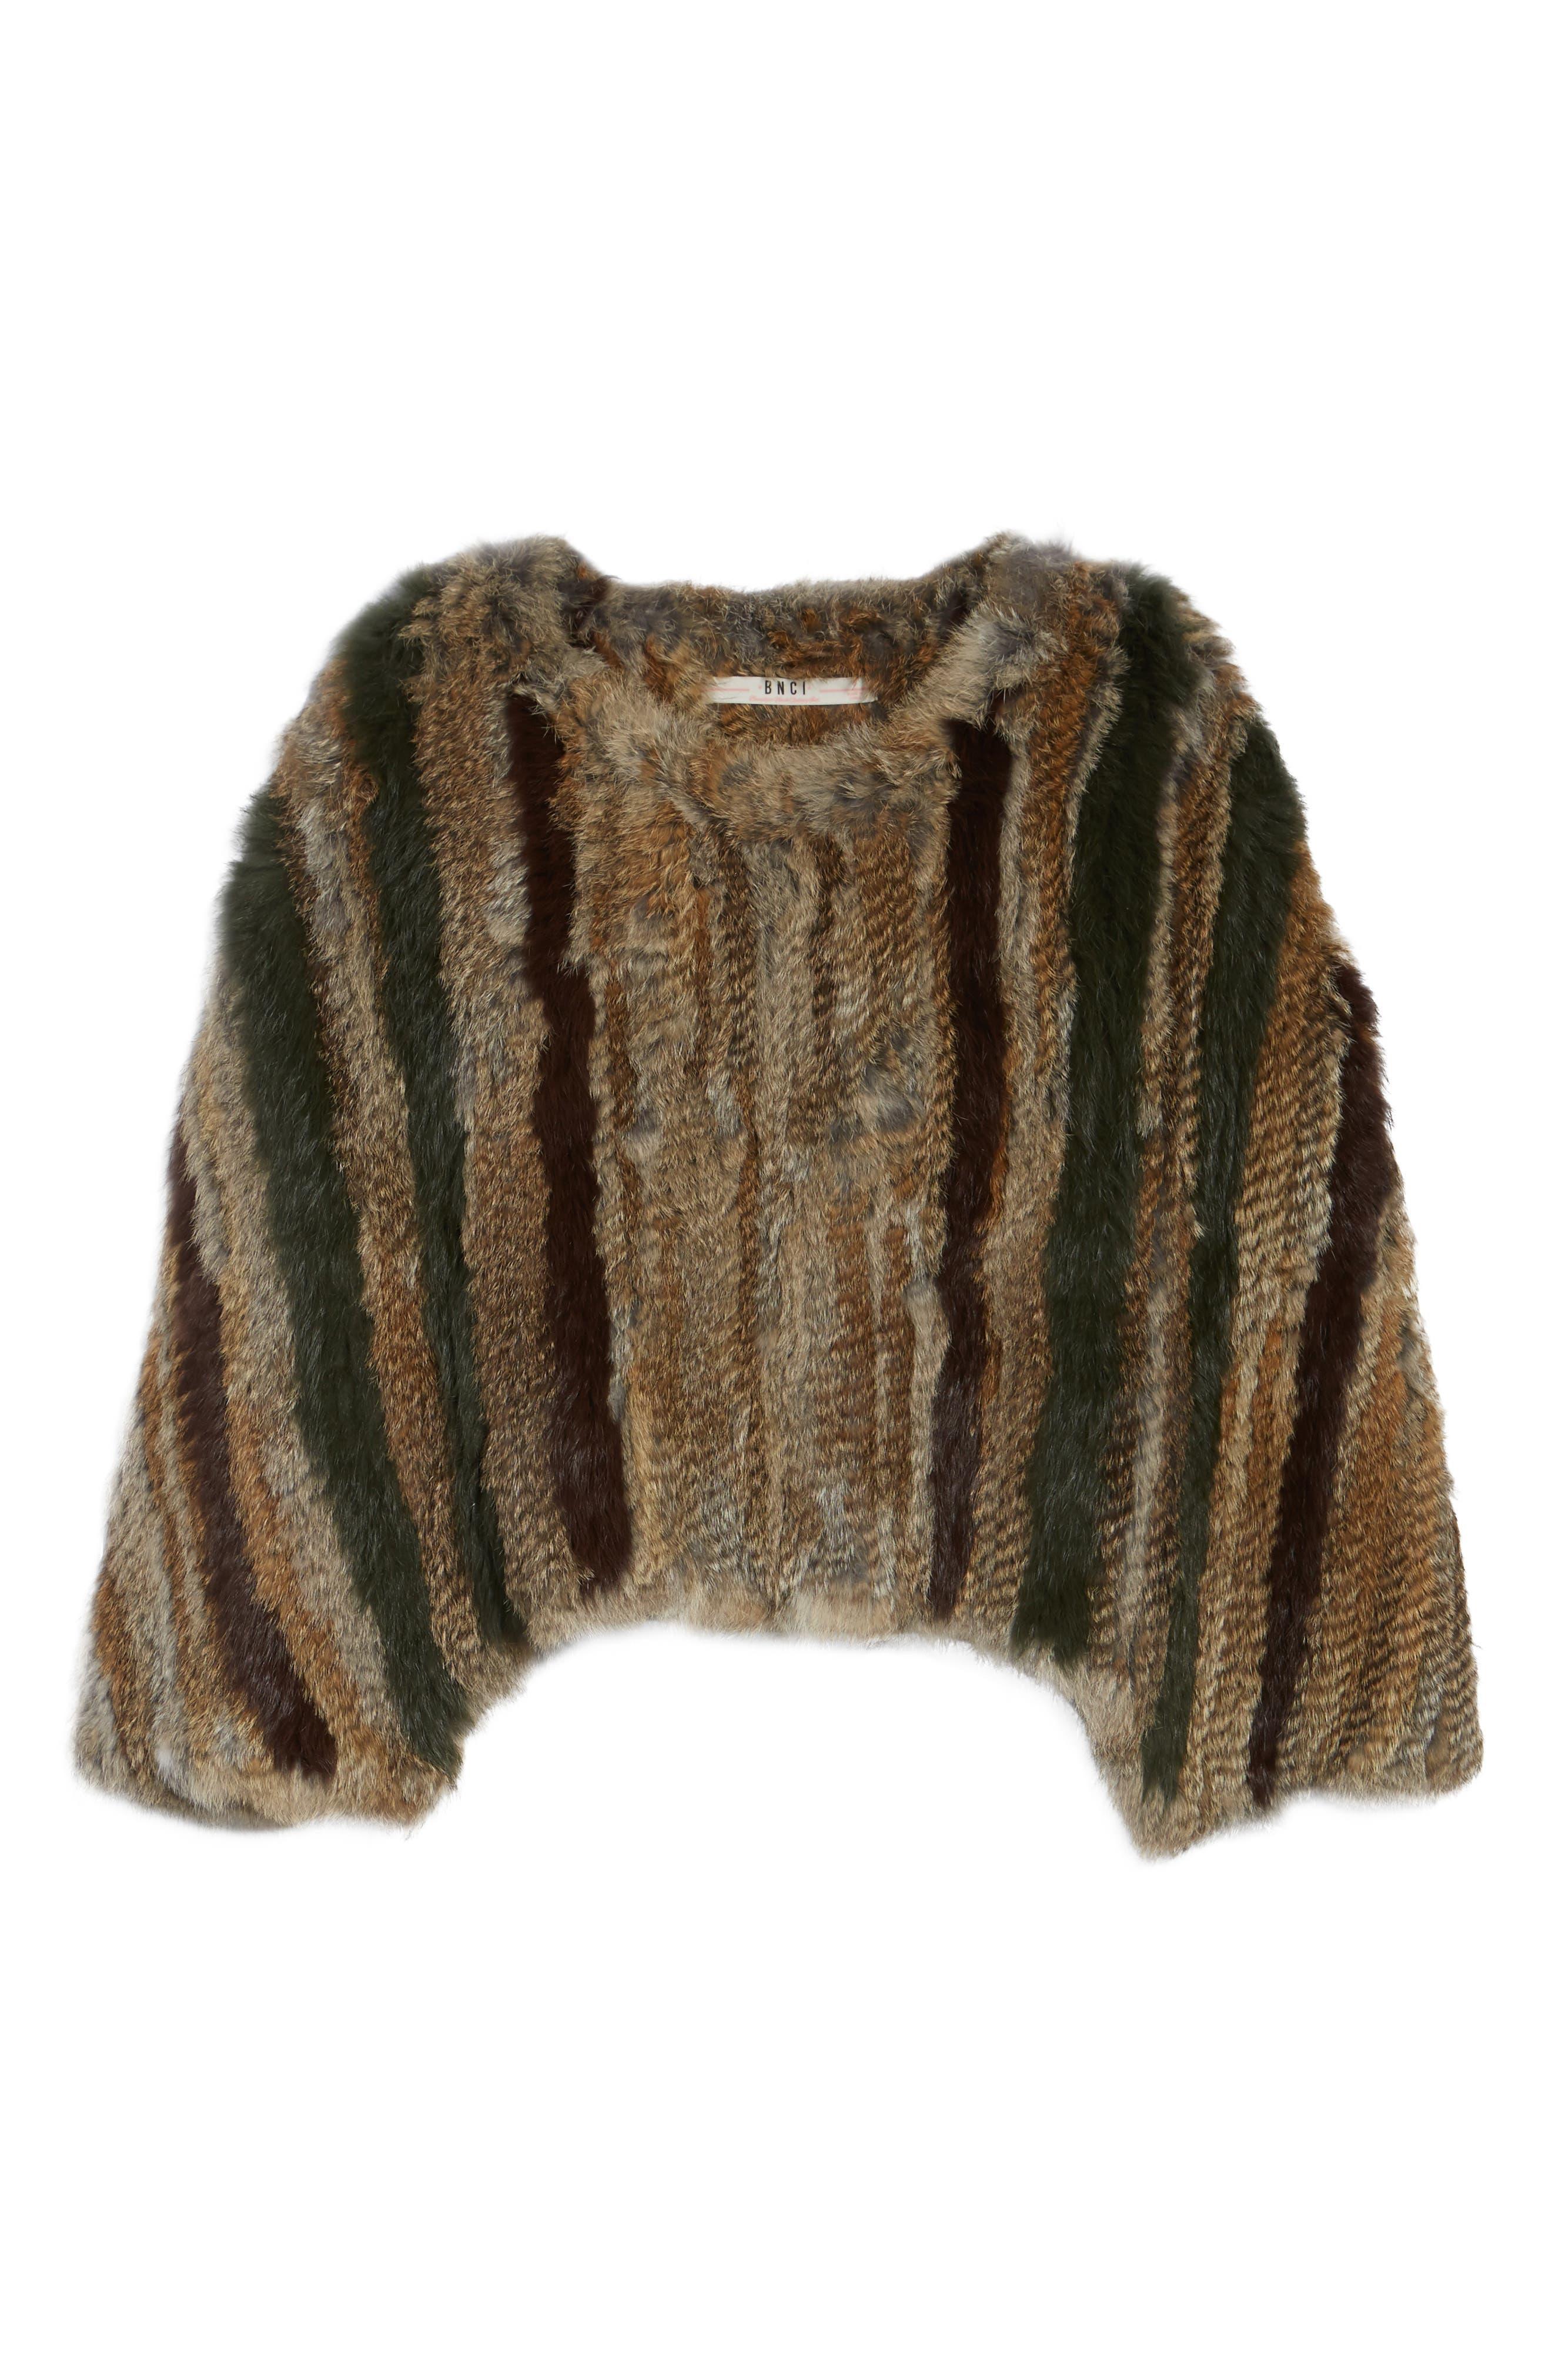 BNCI Nomad Genuine Rabbit Fur Pullover,                             Alternate thumbnail 5, color,                             208